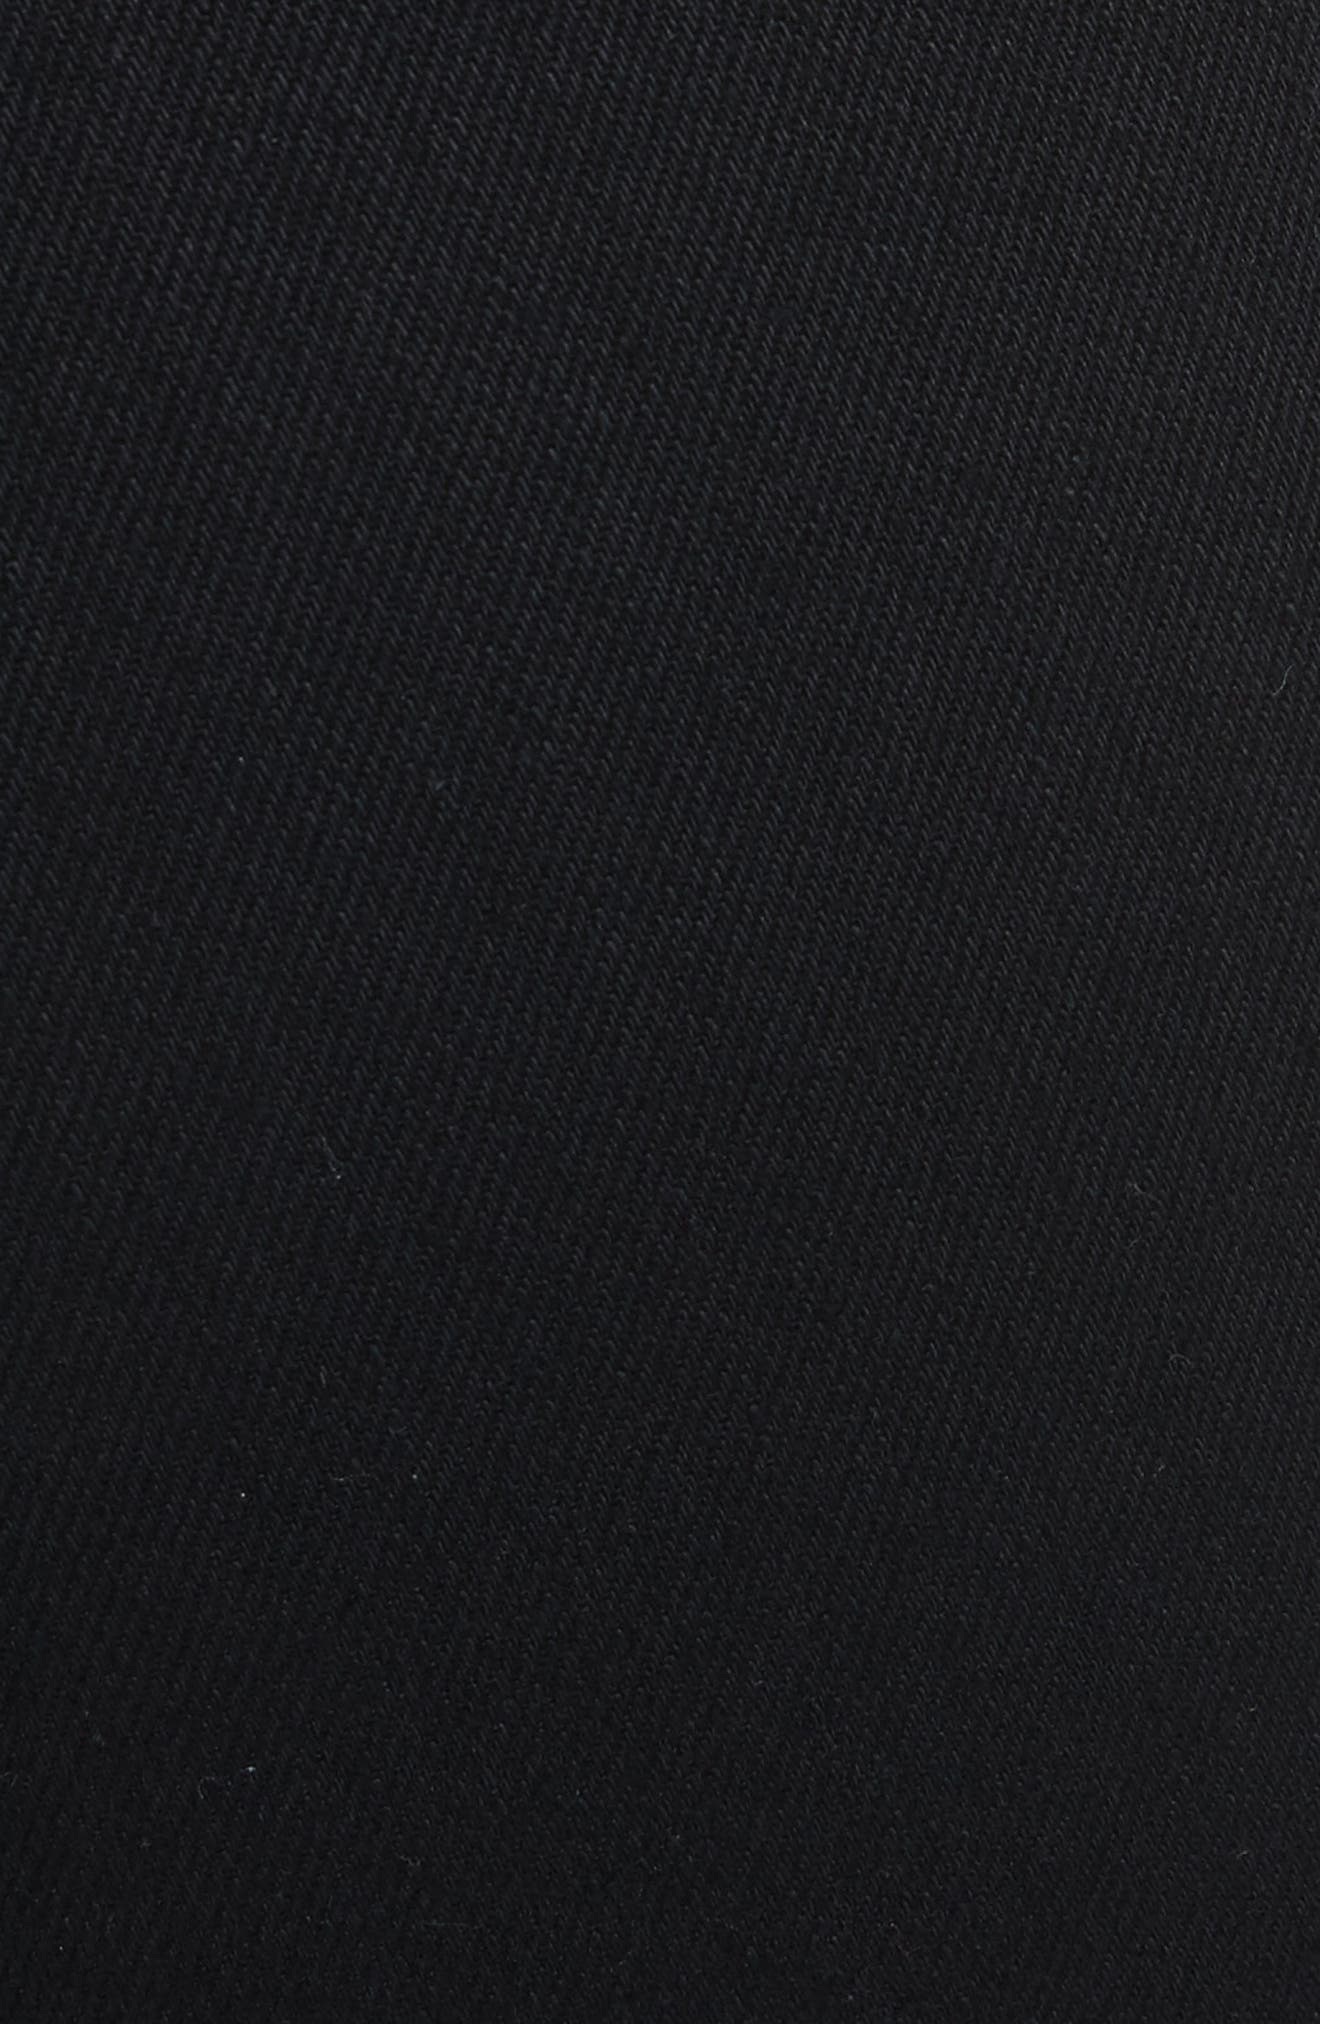 Hina High Rise Crop Pants,                             Alternate thumbnail 5, color,                             Black